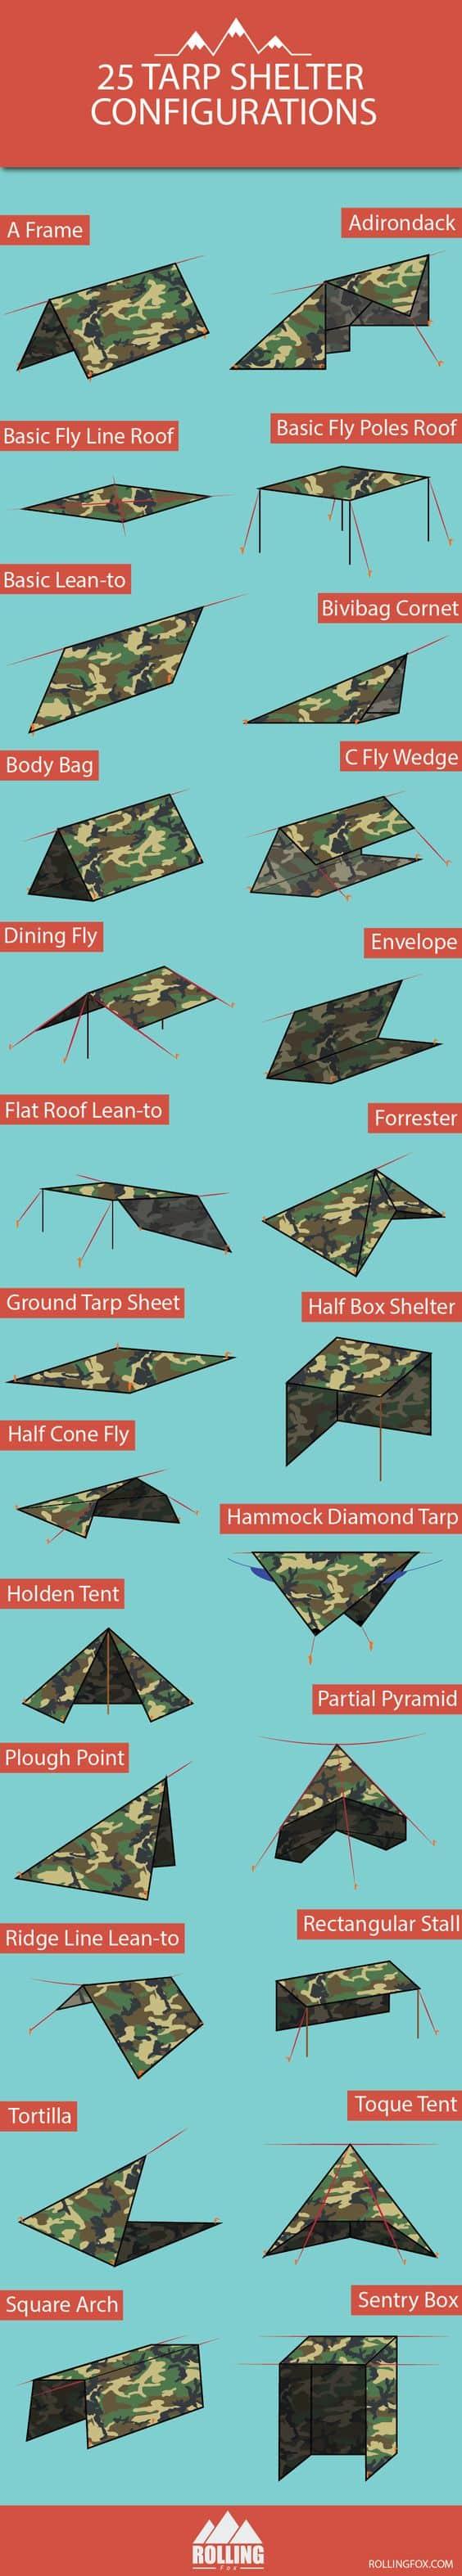 25 Tarp Configurations Infographic